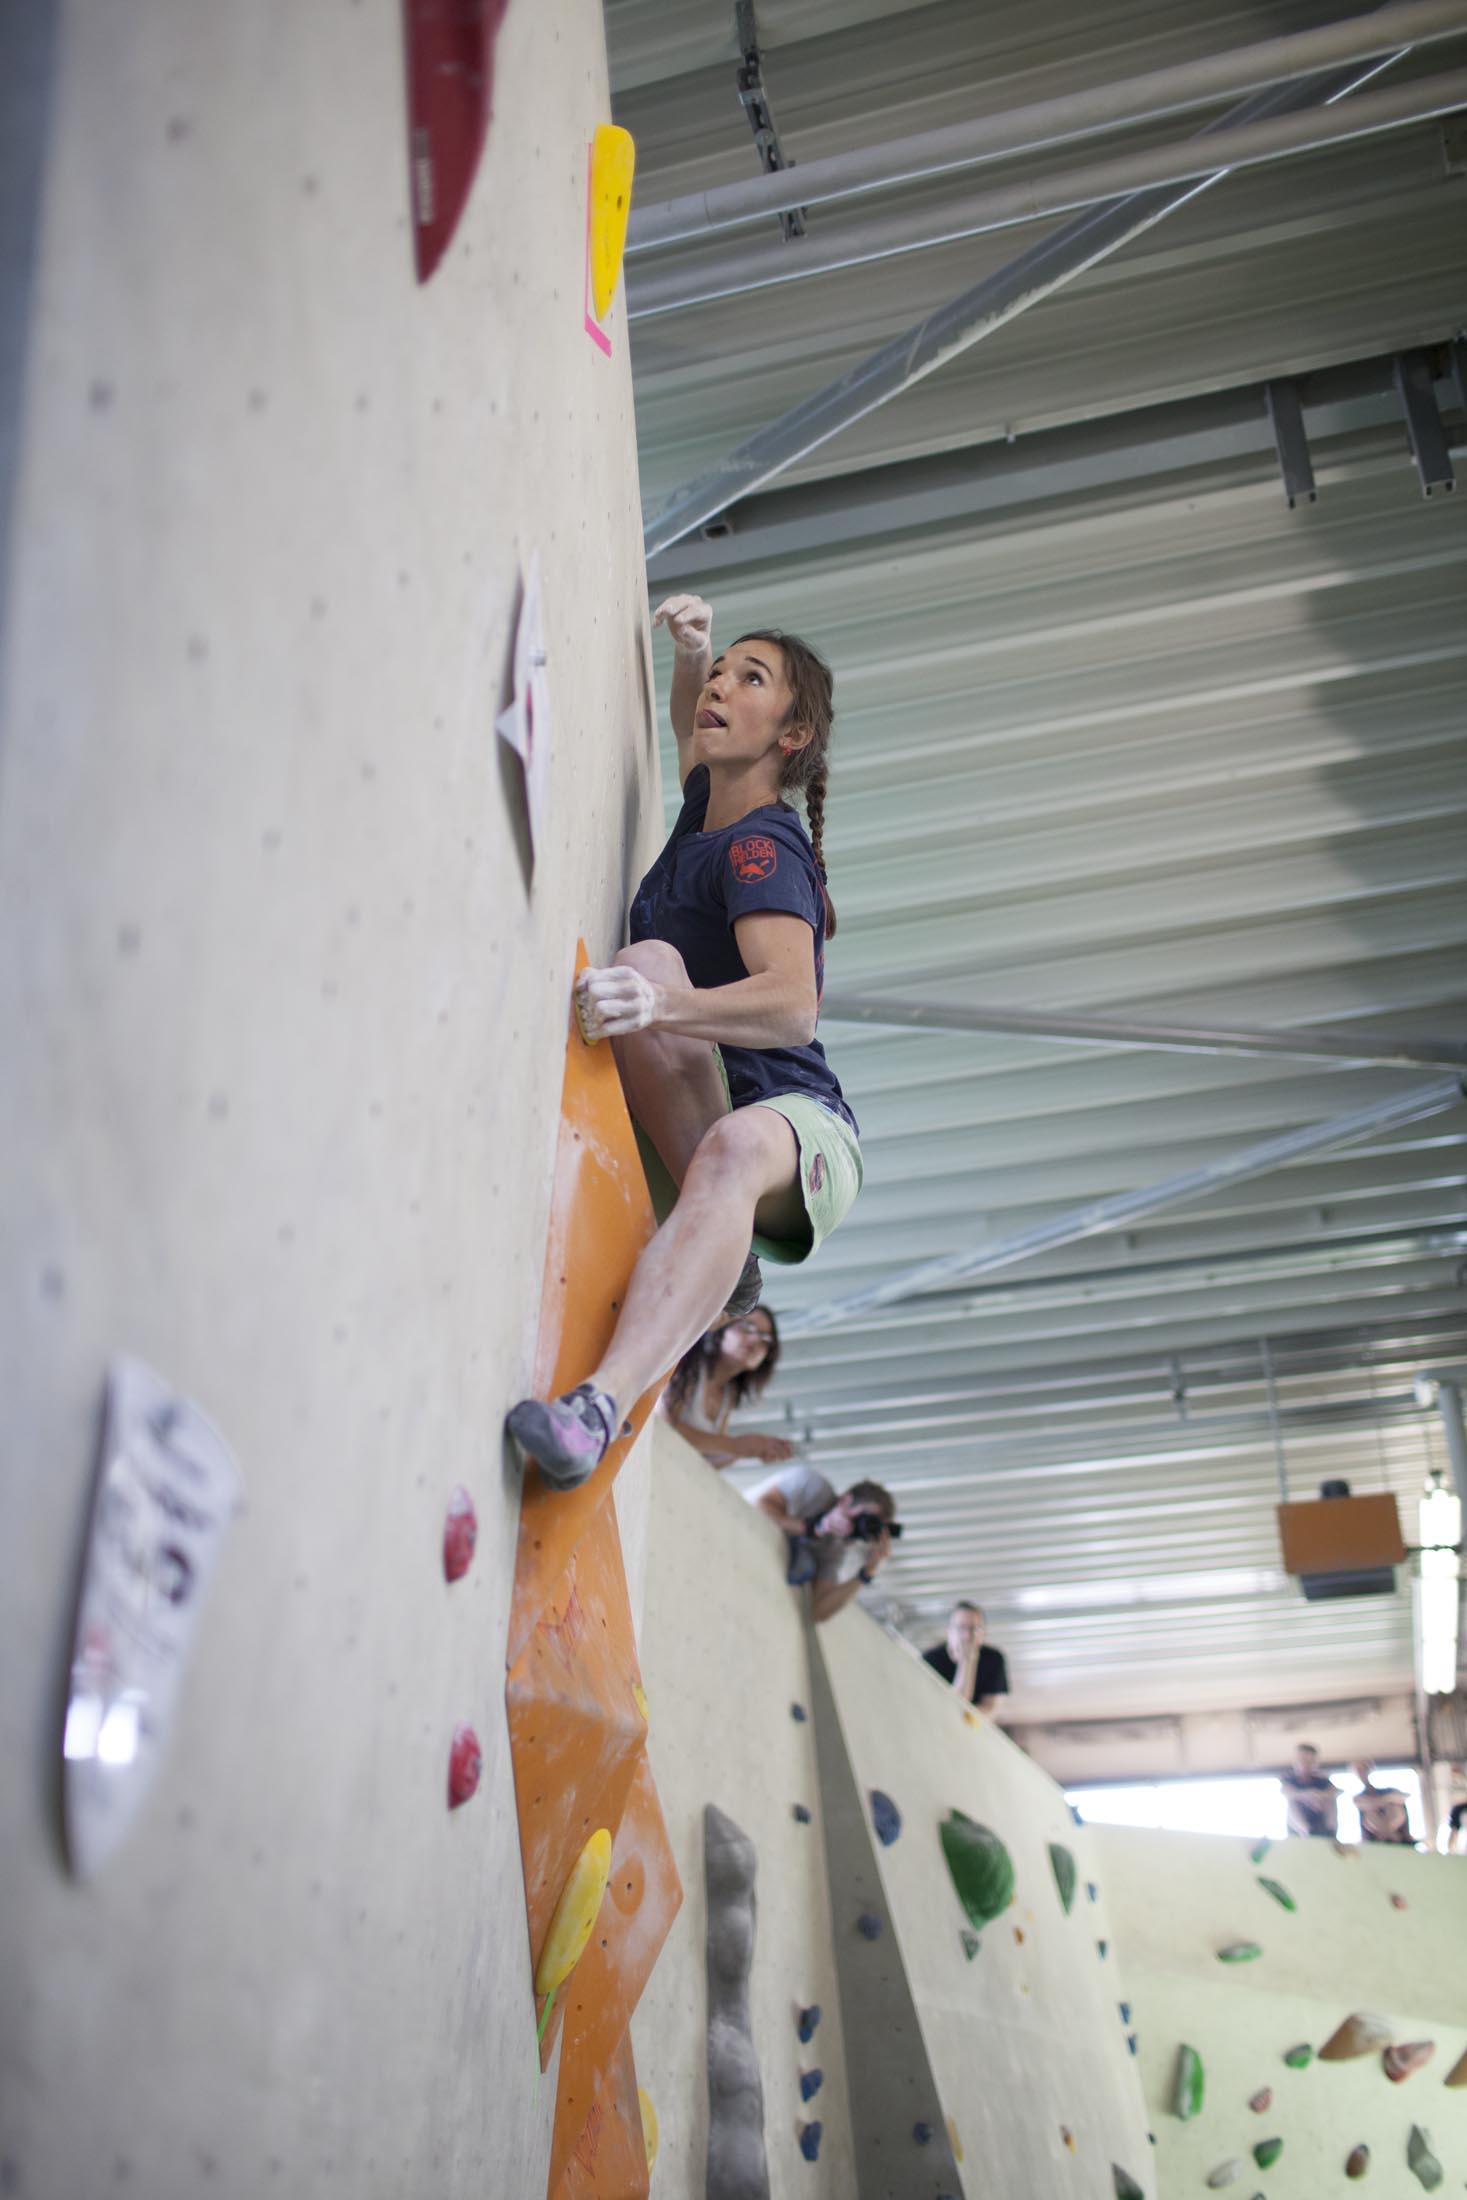 Finale, internationaler bouldercup Frankenjura 2016, BLOCKHELDEN Erlangen, Mammut, Bergfreunde.de, Boulderwettkampf07092016528